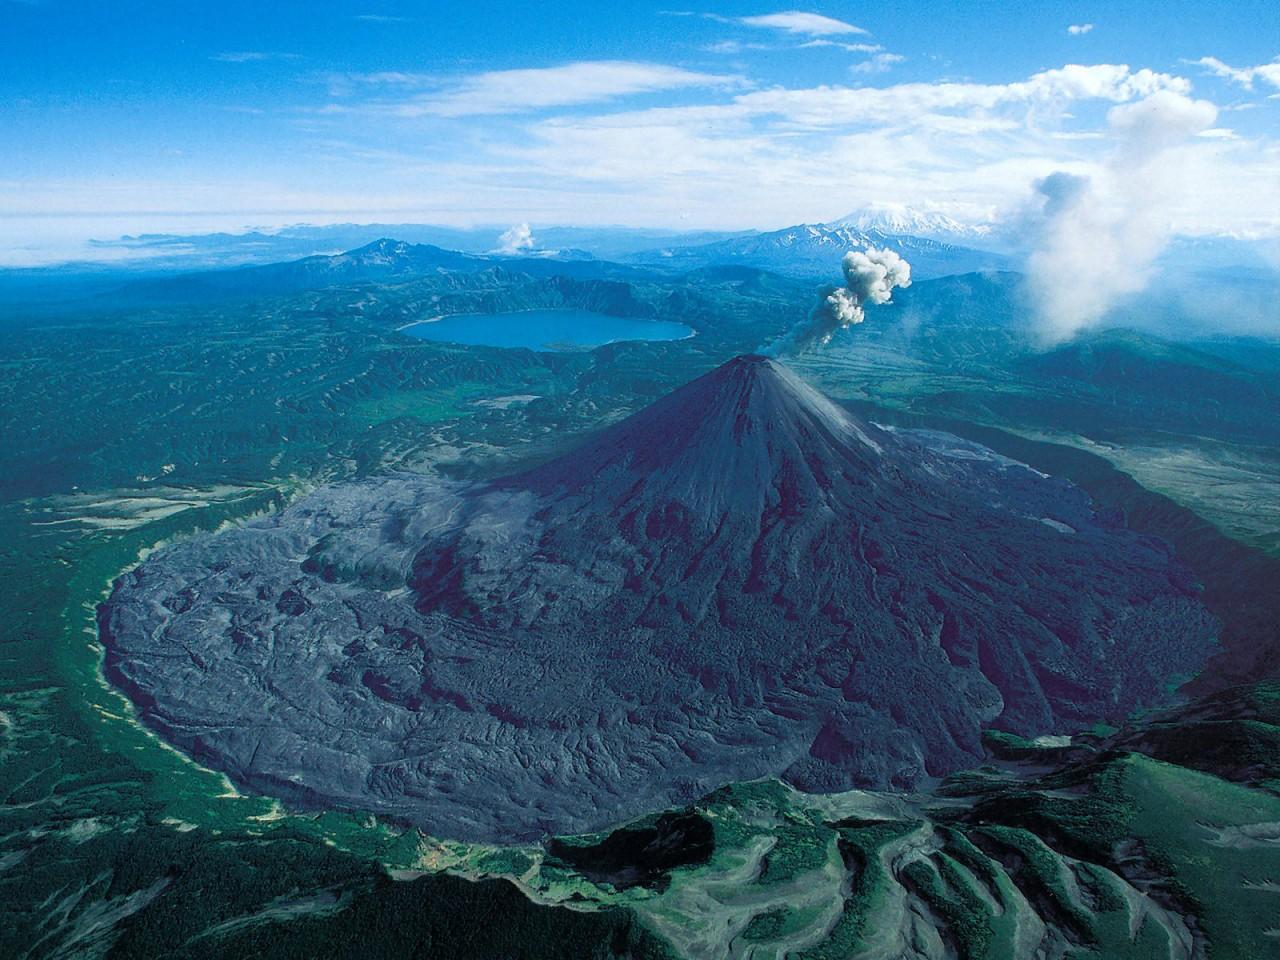 Karymsky volcano, Kamchatka, Russia. More info here: https://en.wikipedia.org/wiki/Karymsky_(vol ...